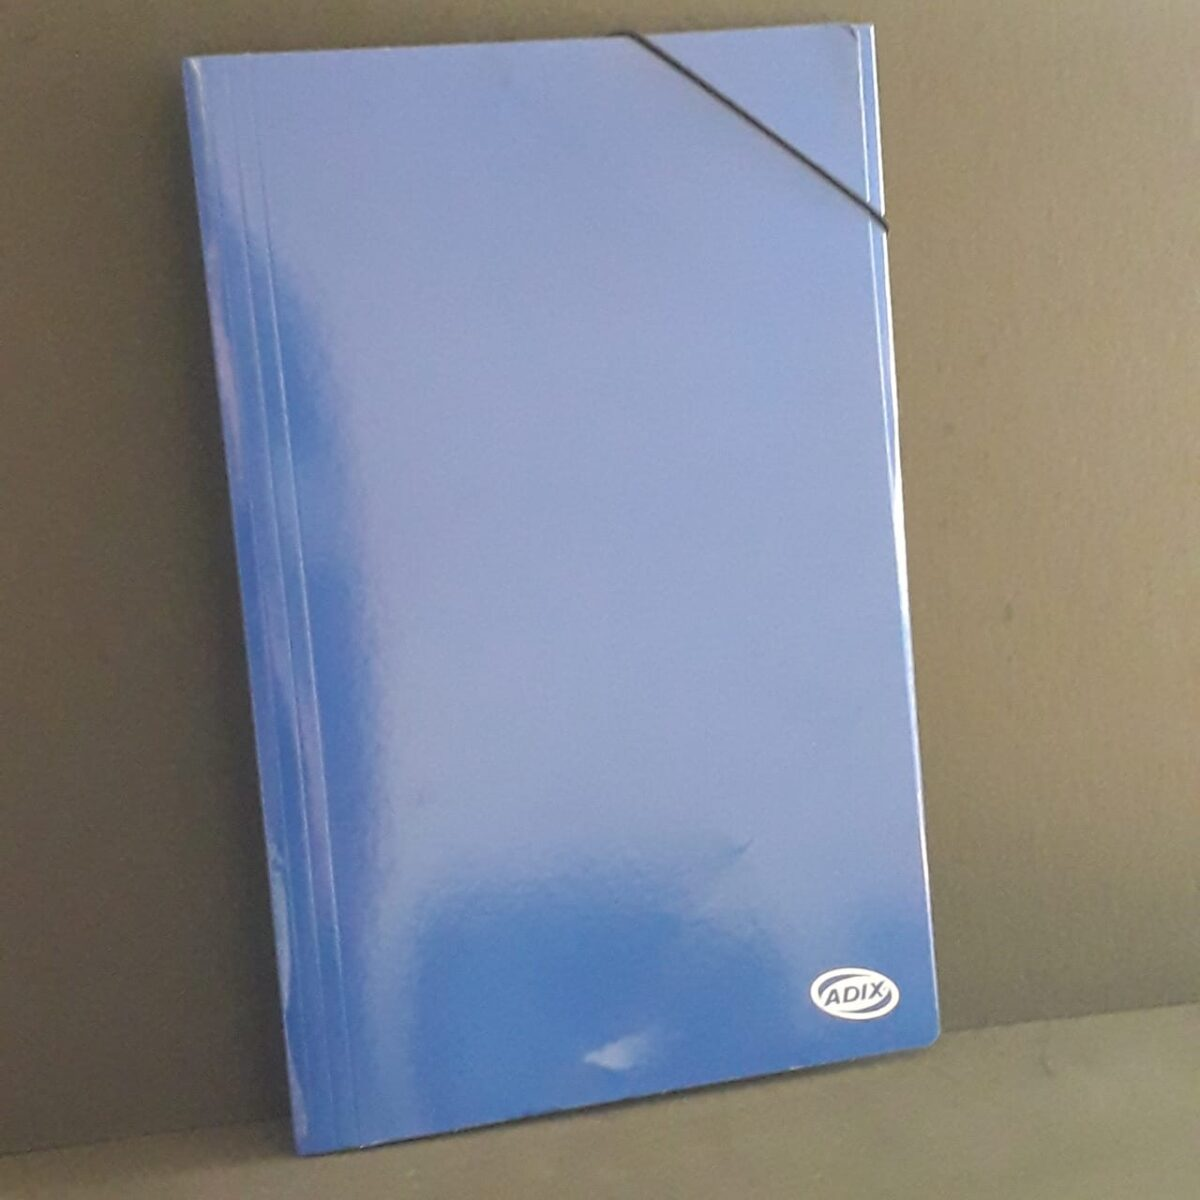 Carpeta Oficio Carton C/Elas. Azul (002) Adix